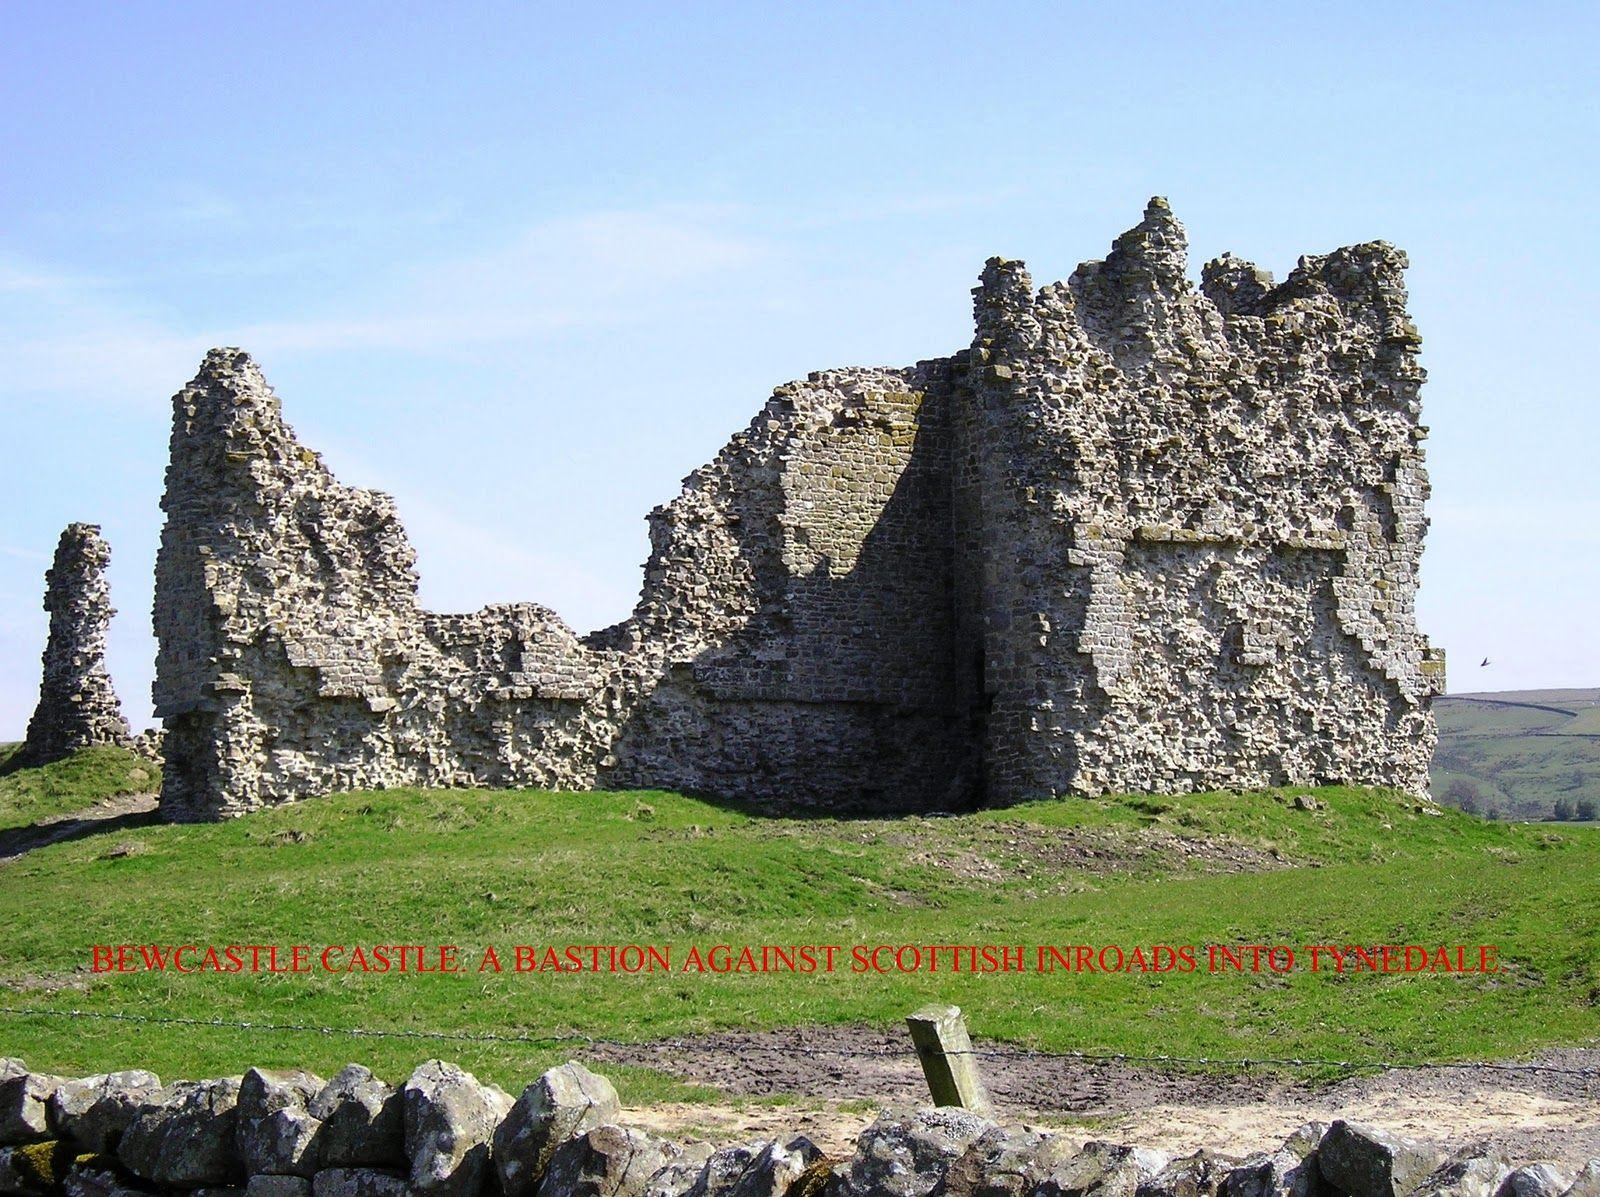 Bewcastle Castle was garrisoned against the Border Reivers